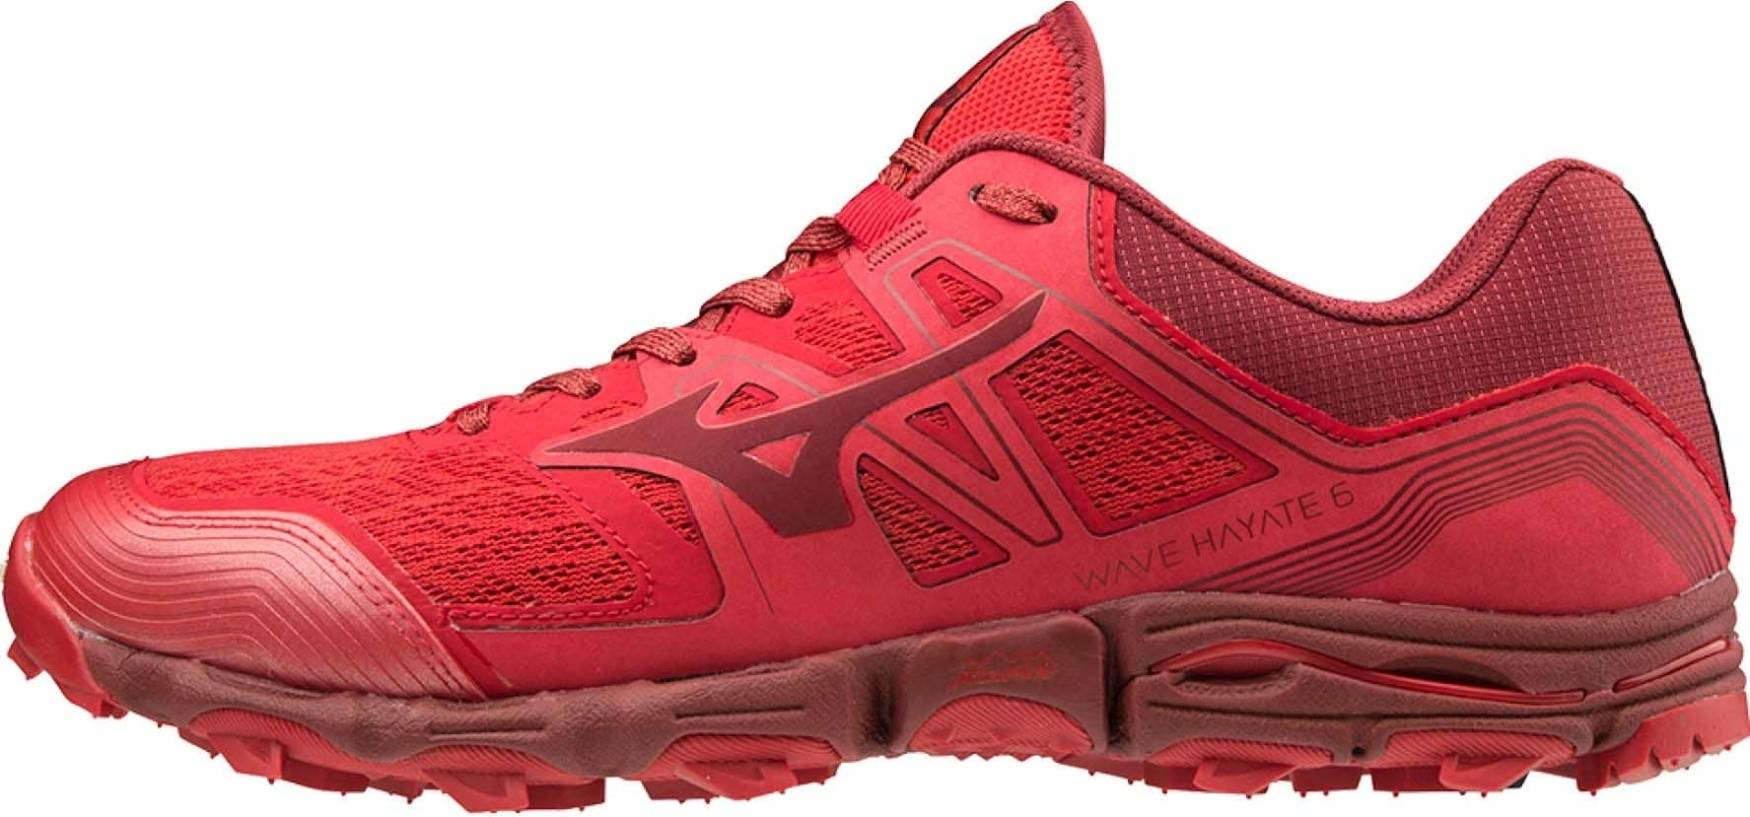 mens mizuno running shoes size 9.5 eu weight only lifting